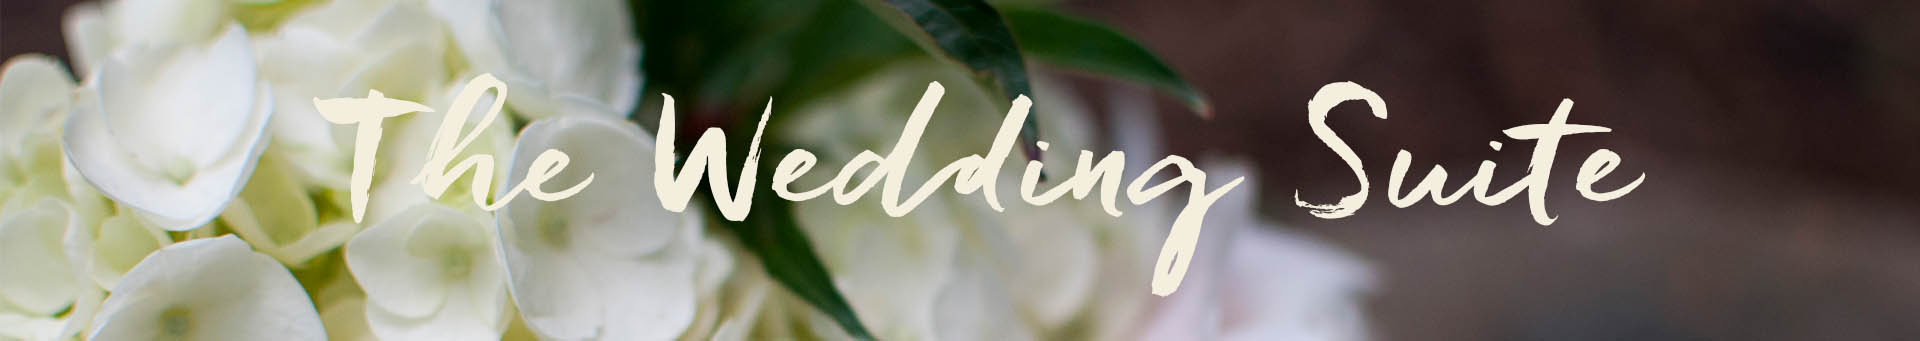 Wedding Suite | Anna Howe Design